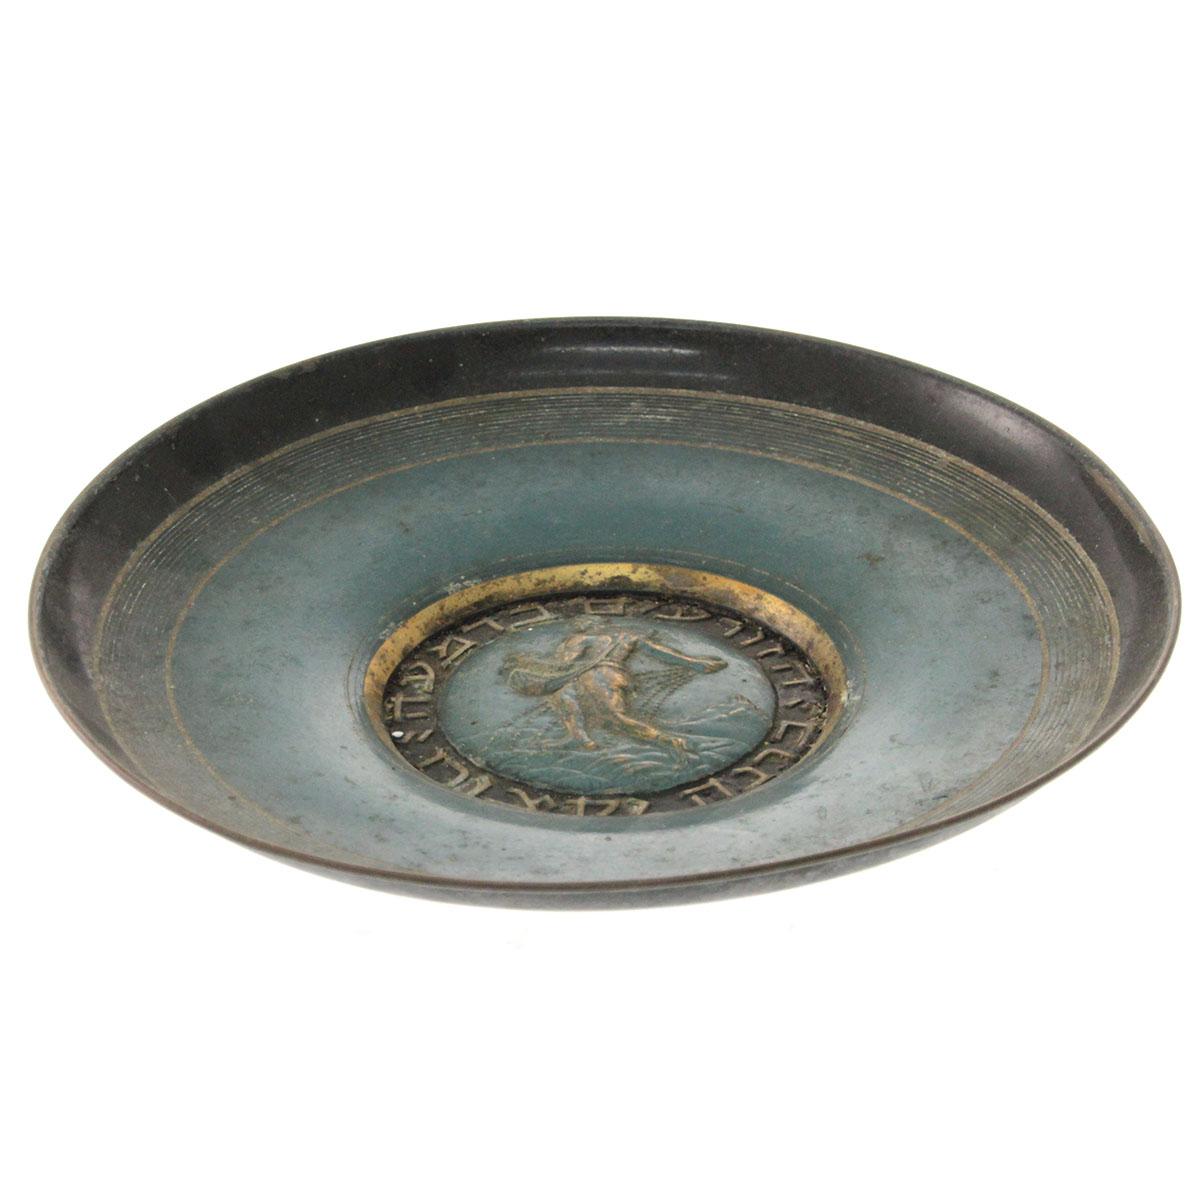 Pasarel Pal Bell Brass Decorative Plate Israel 1950 S